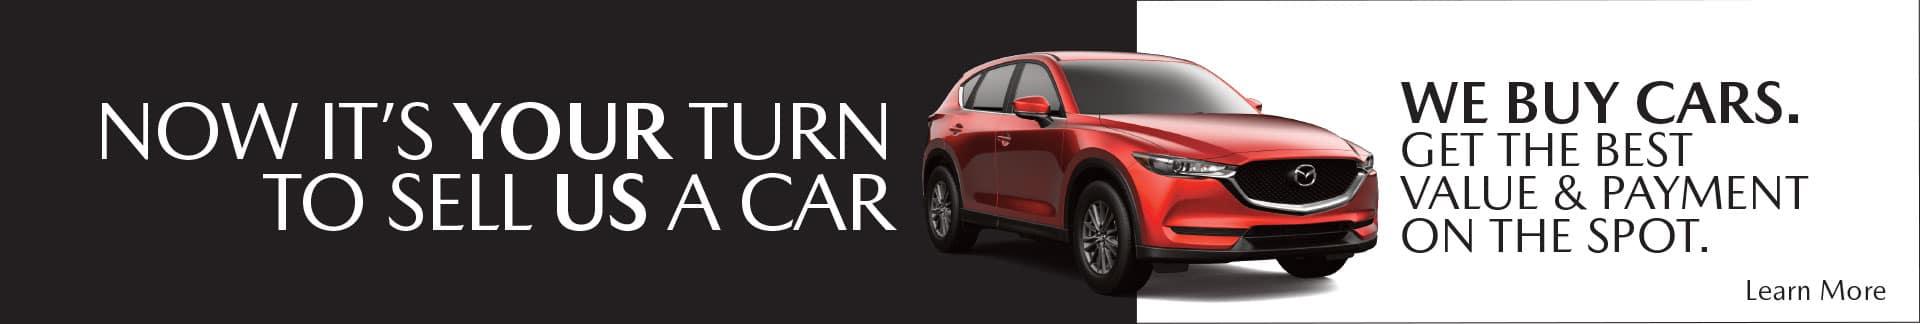 Car-Buying-Banner-Mazda